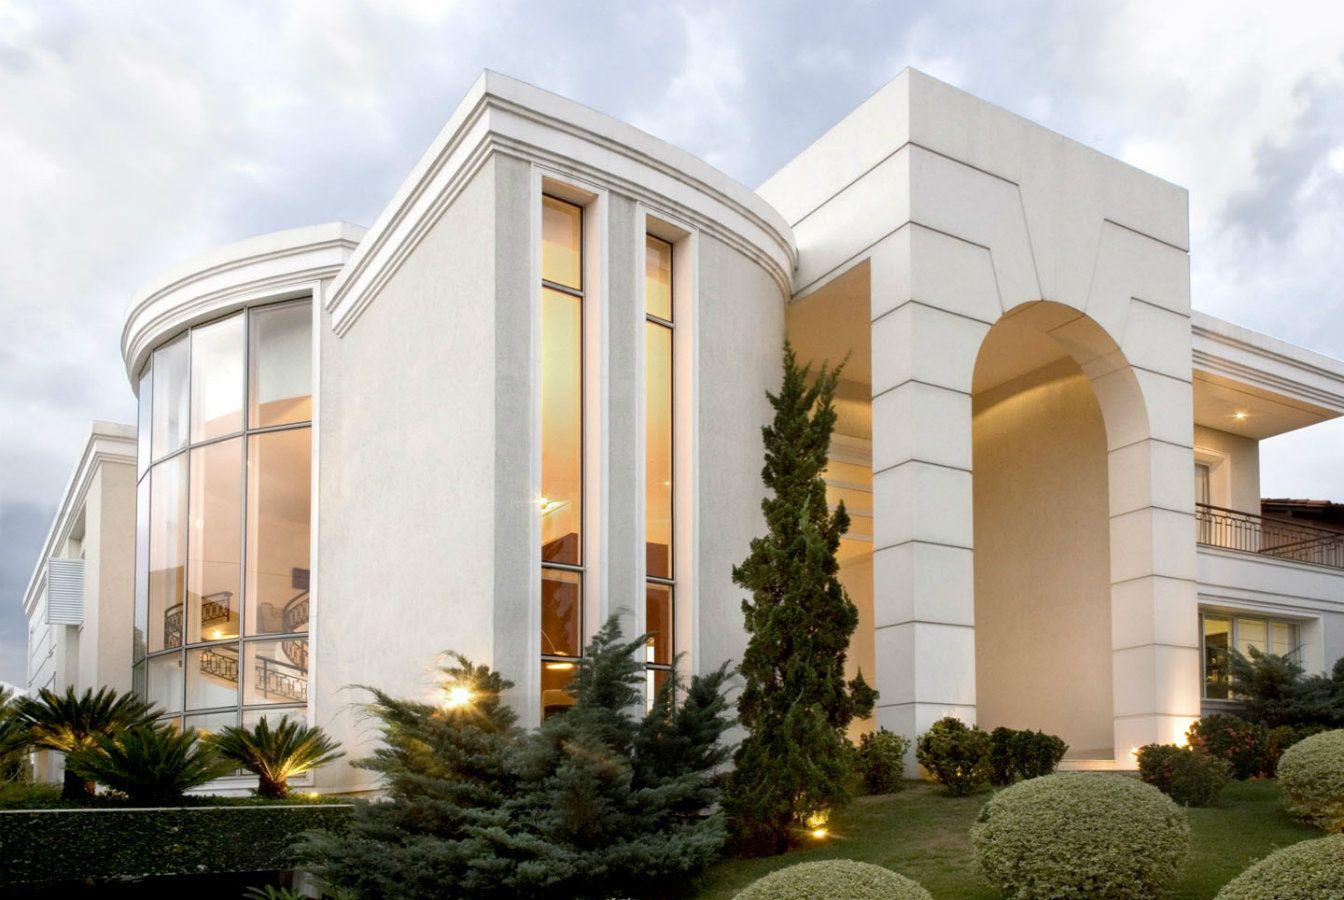 Fachadas de casas lindas e de diferentes estilos veja for Exteriores de casas modernas